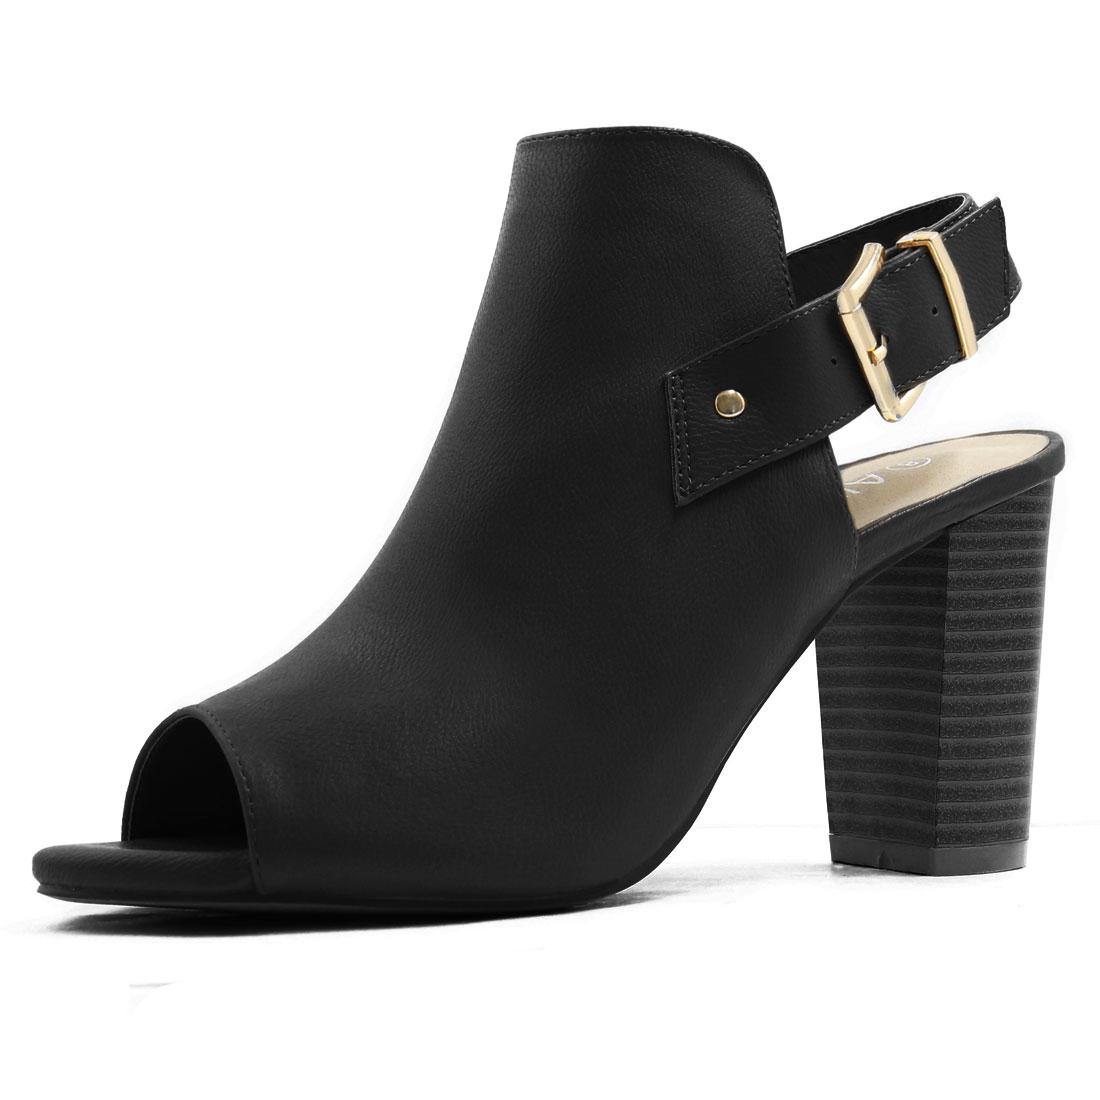 Women Peep Toe Slip On Stacked Heel Slingback Sandals Black US 6.5